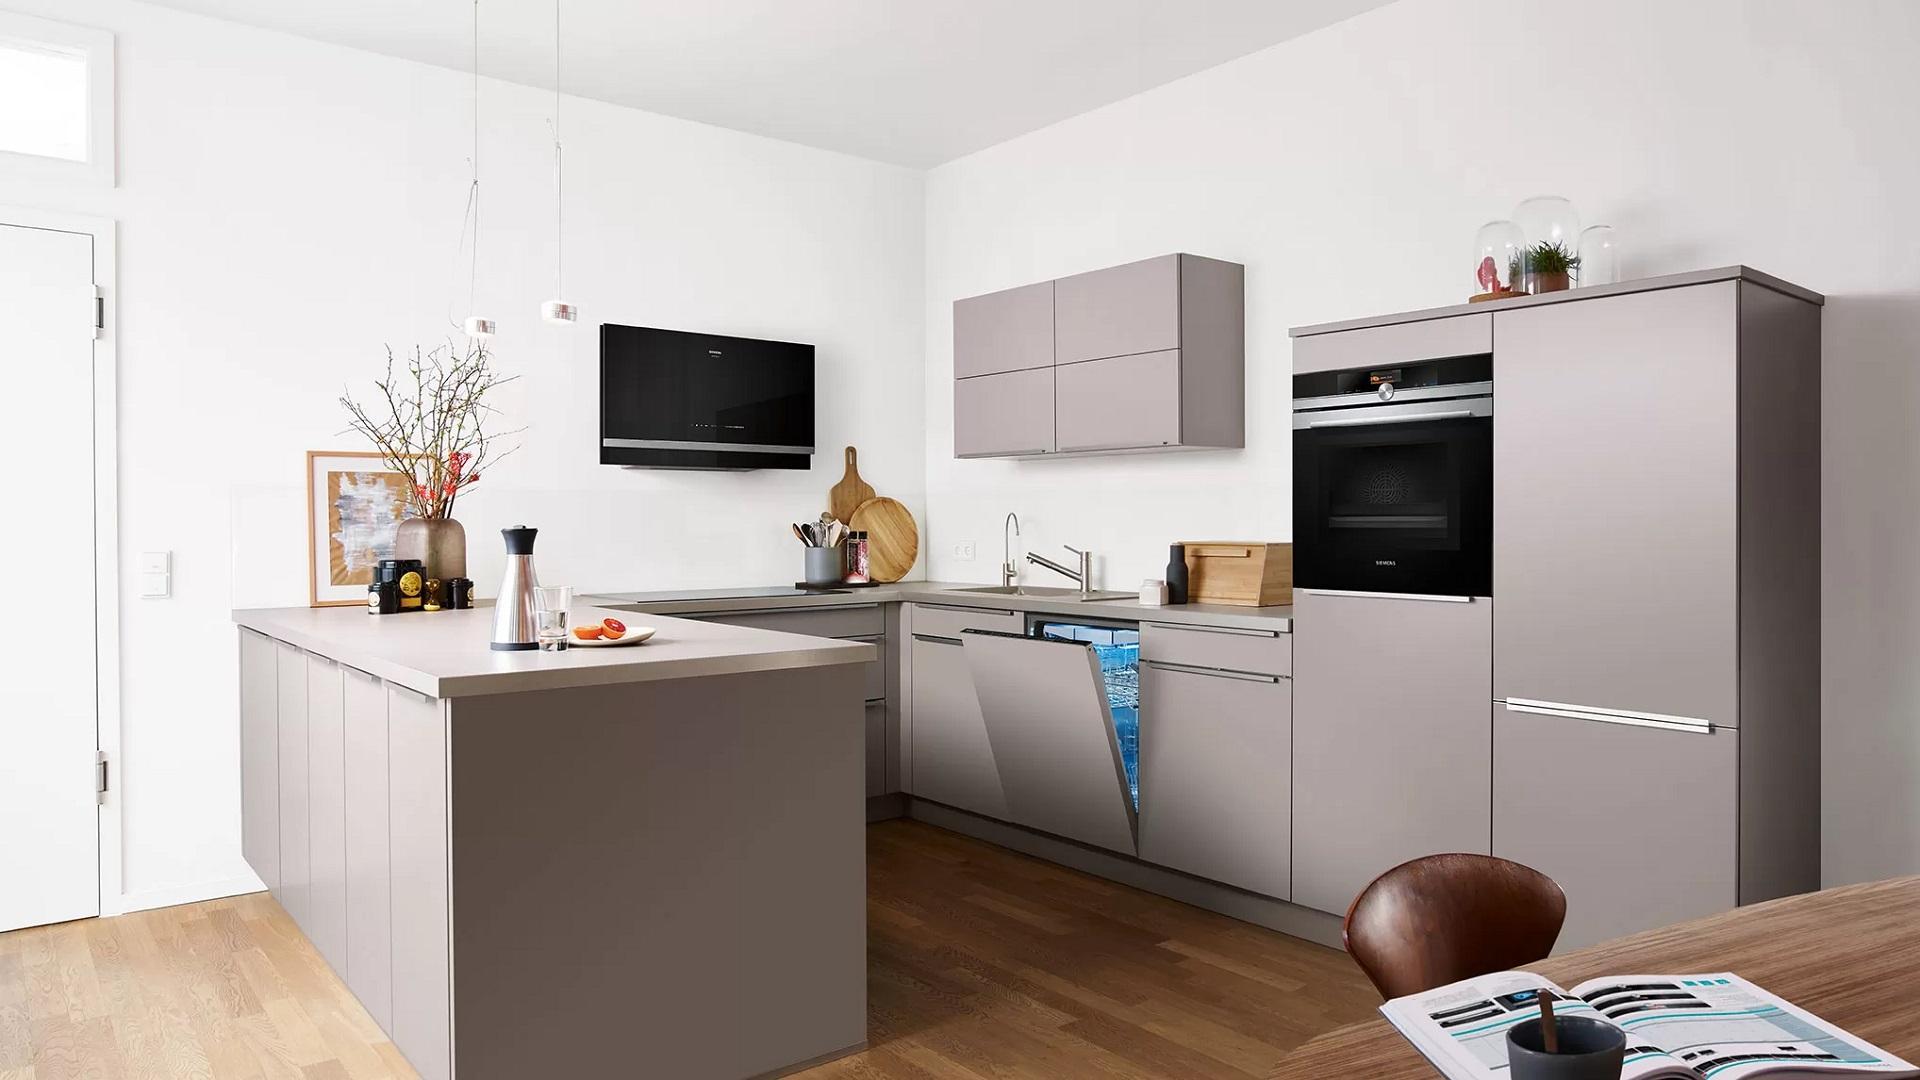 electrodomésticos innovadores